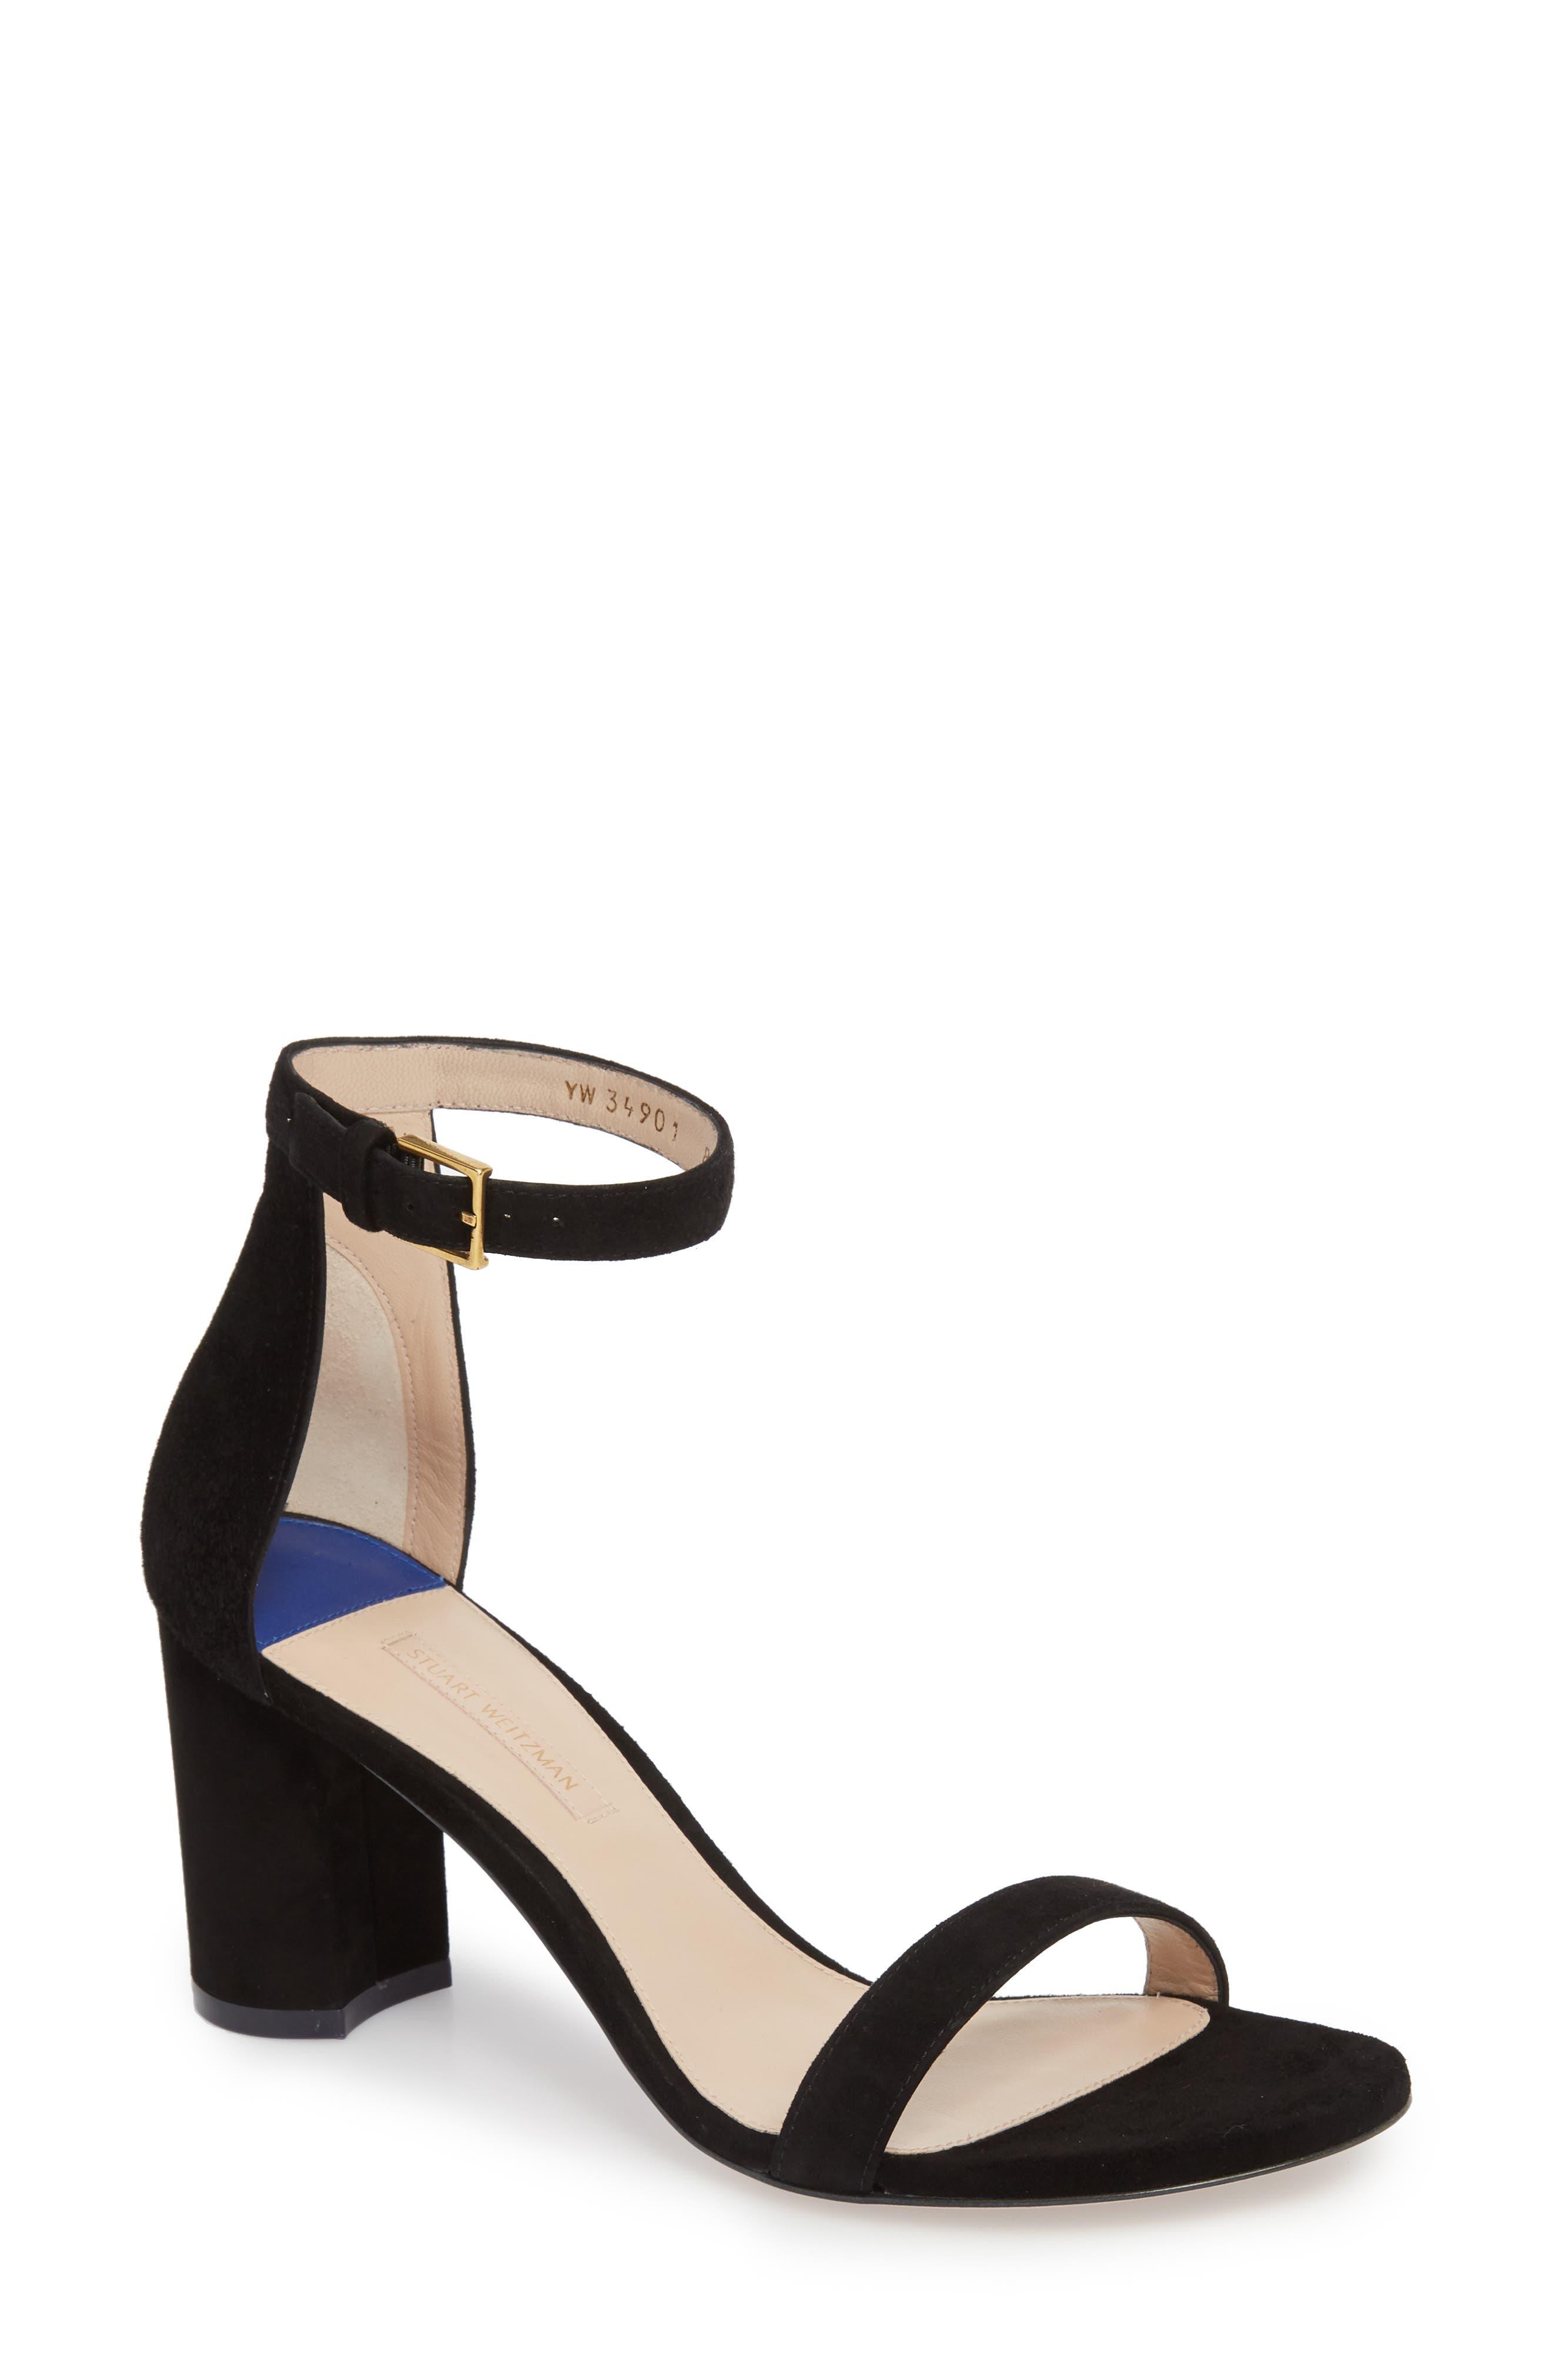 Stuart Weitzman 75Lessnudist Ankle Strap Sandal, Black